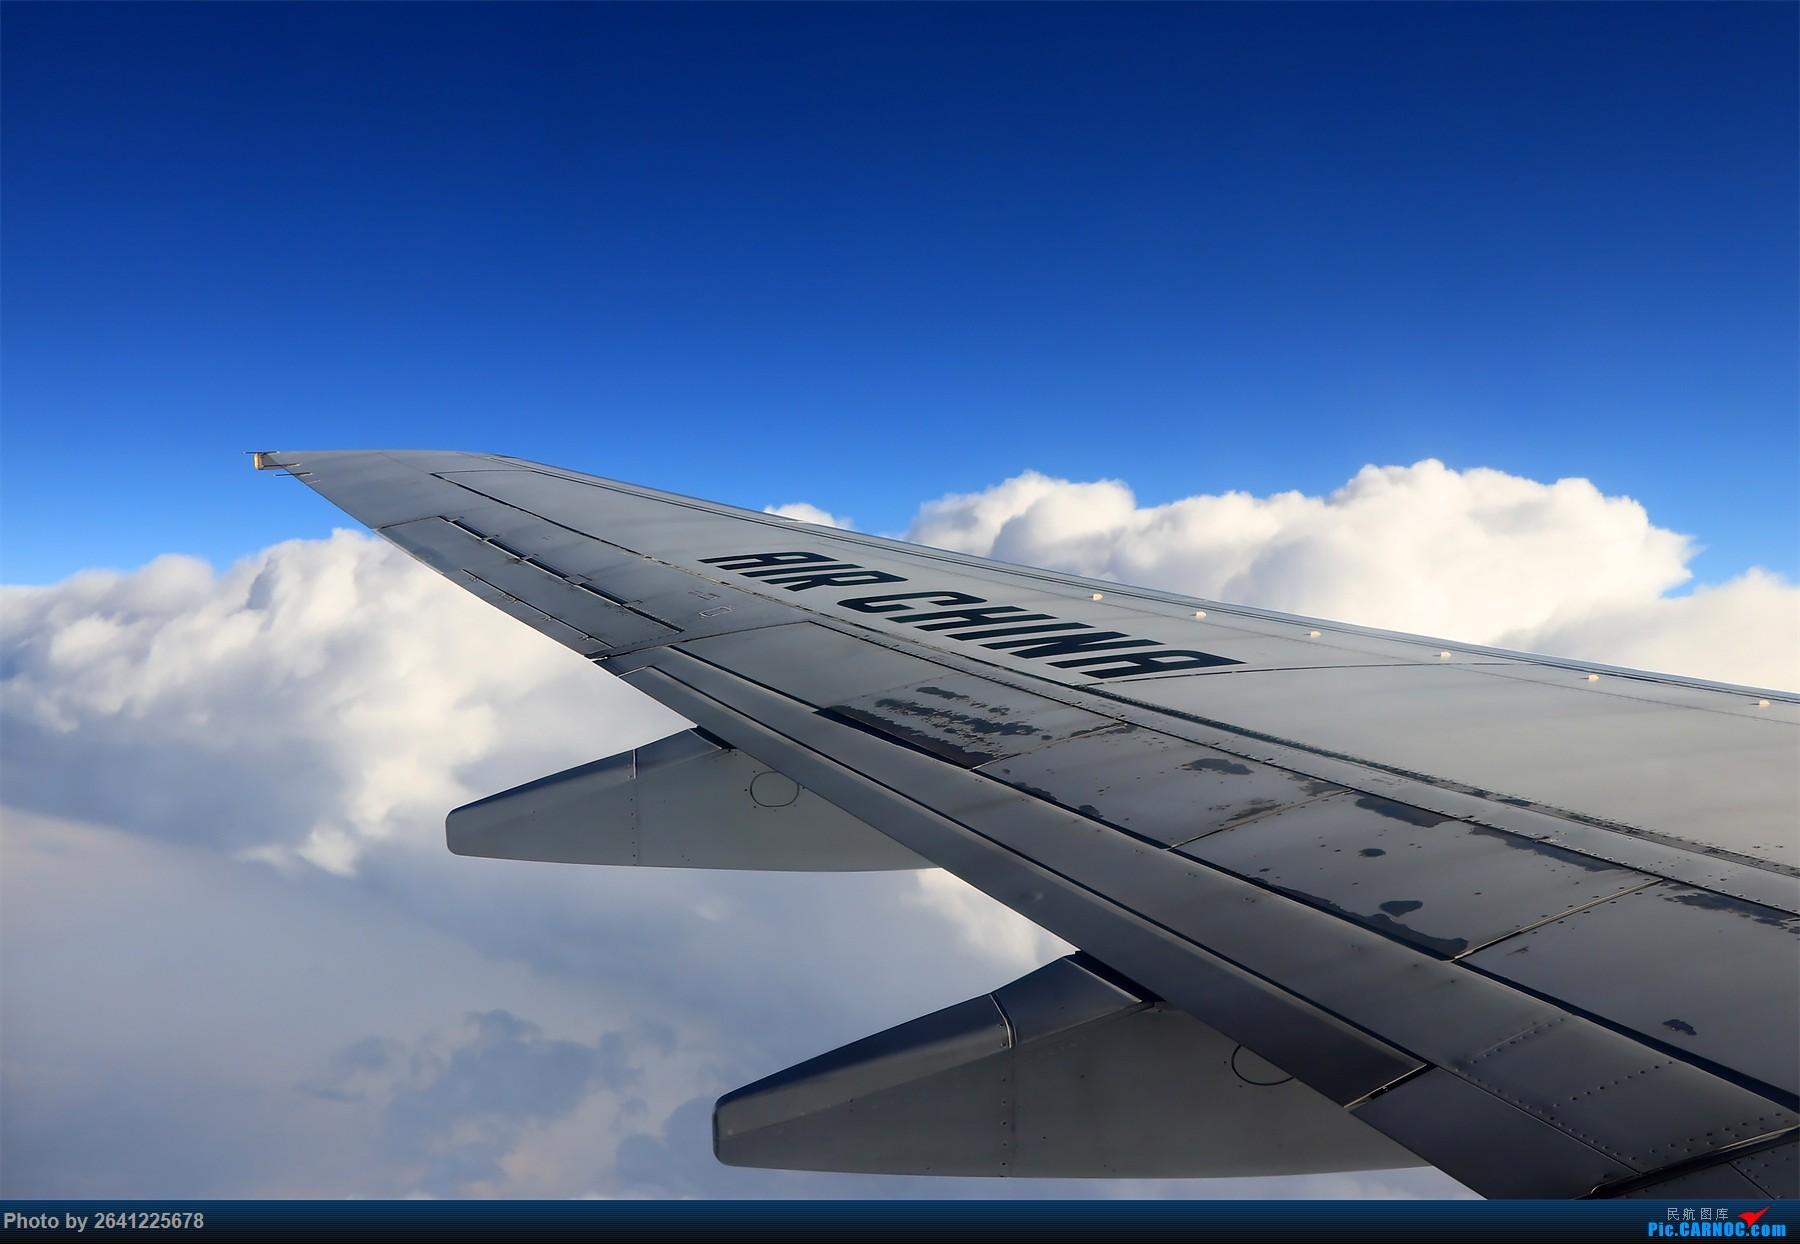 Re:[原创]【和小周飞拍世界第4集】空铁联运回家乡,长白延边好风光(家庭出游+探亲吉林6日游)*****更新至延吉部分,有FLIGHT LOG***** BOEING 737-800 B-5328 中国延吉朝阳川国际机场